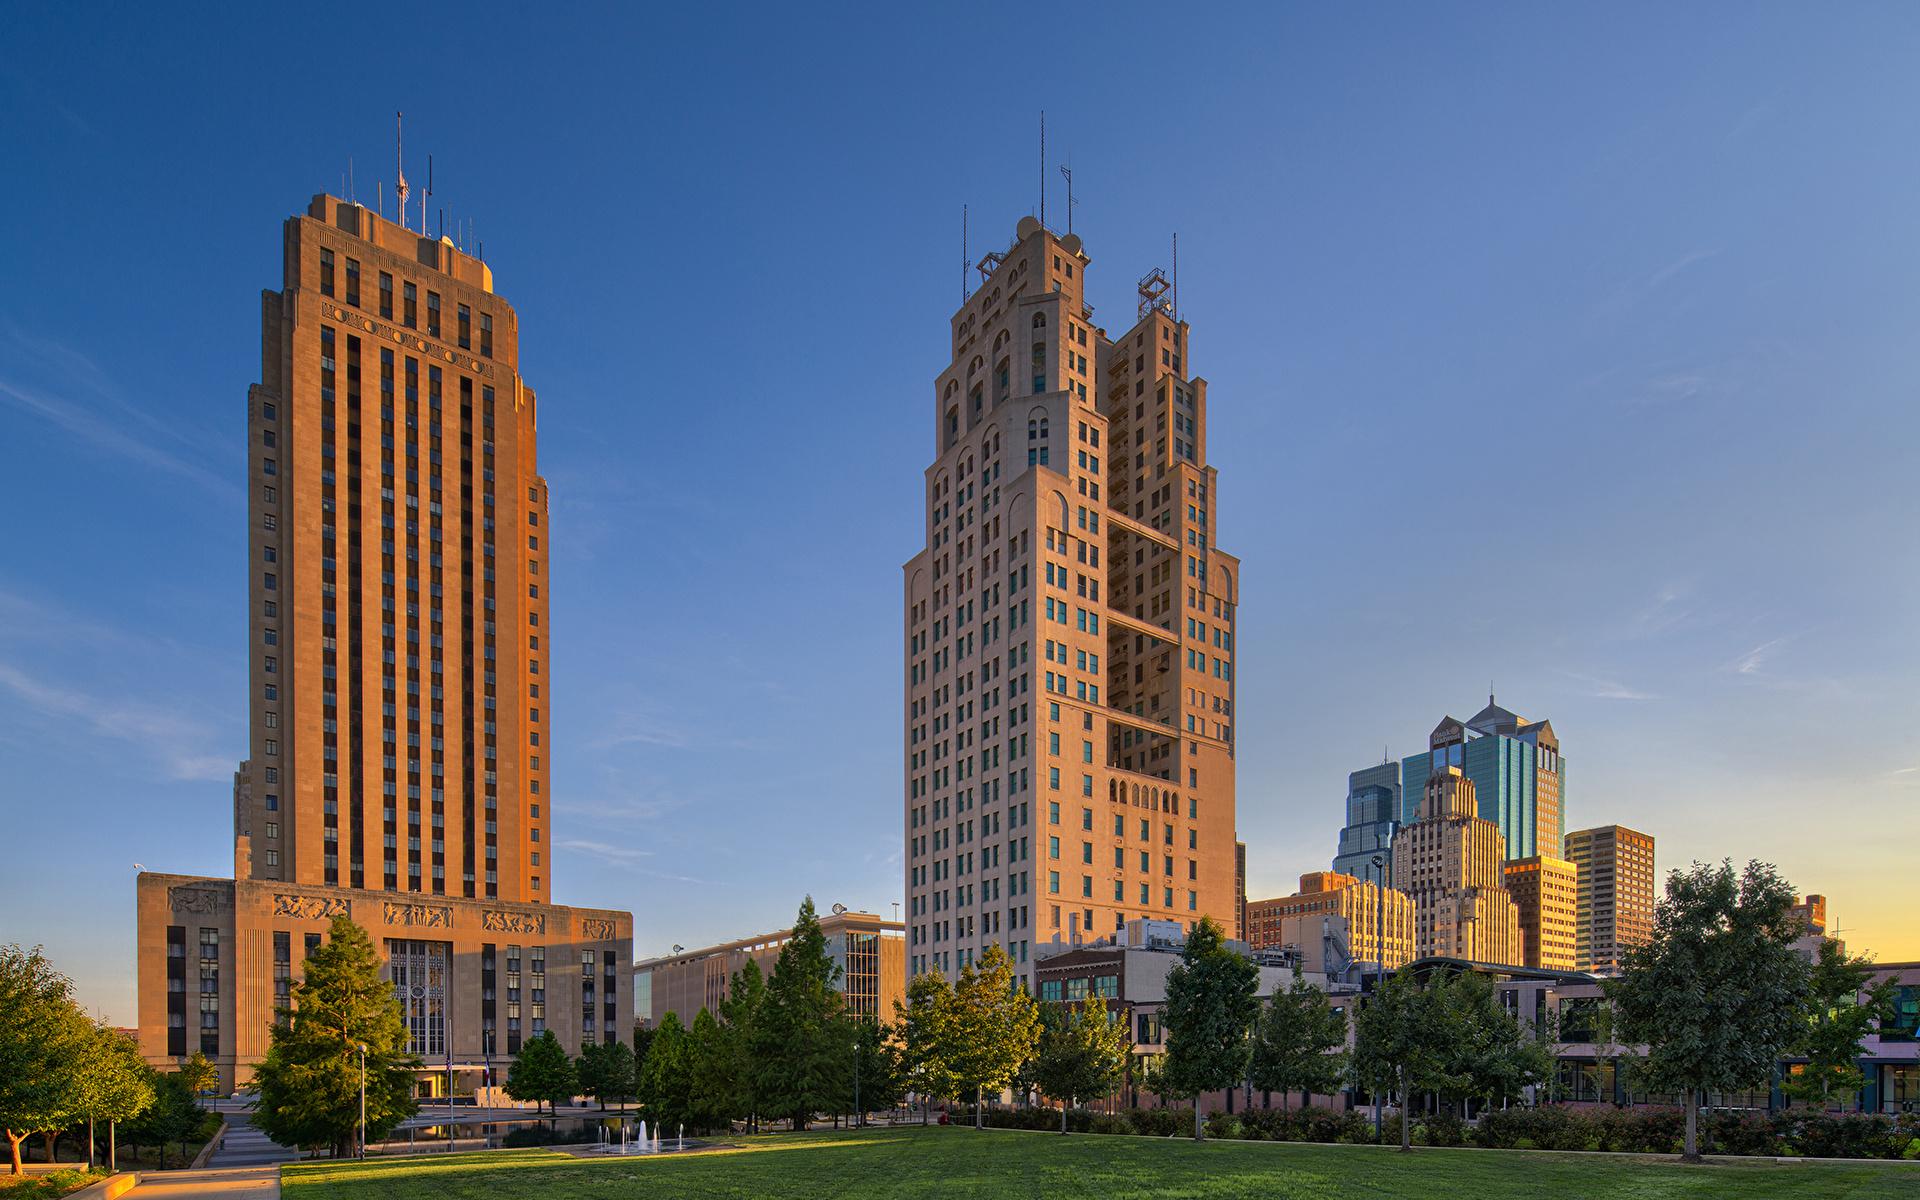 1920x1200、アメリカ合衆国、住宅、Kansas Missouri、芝、木、建物、都市、